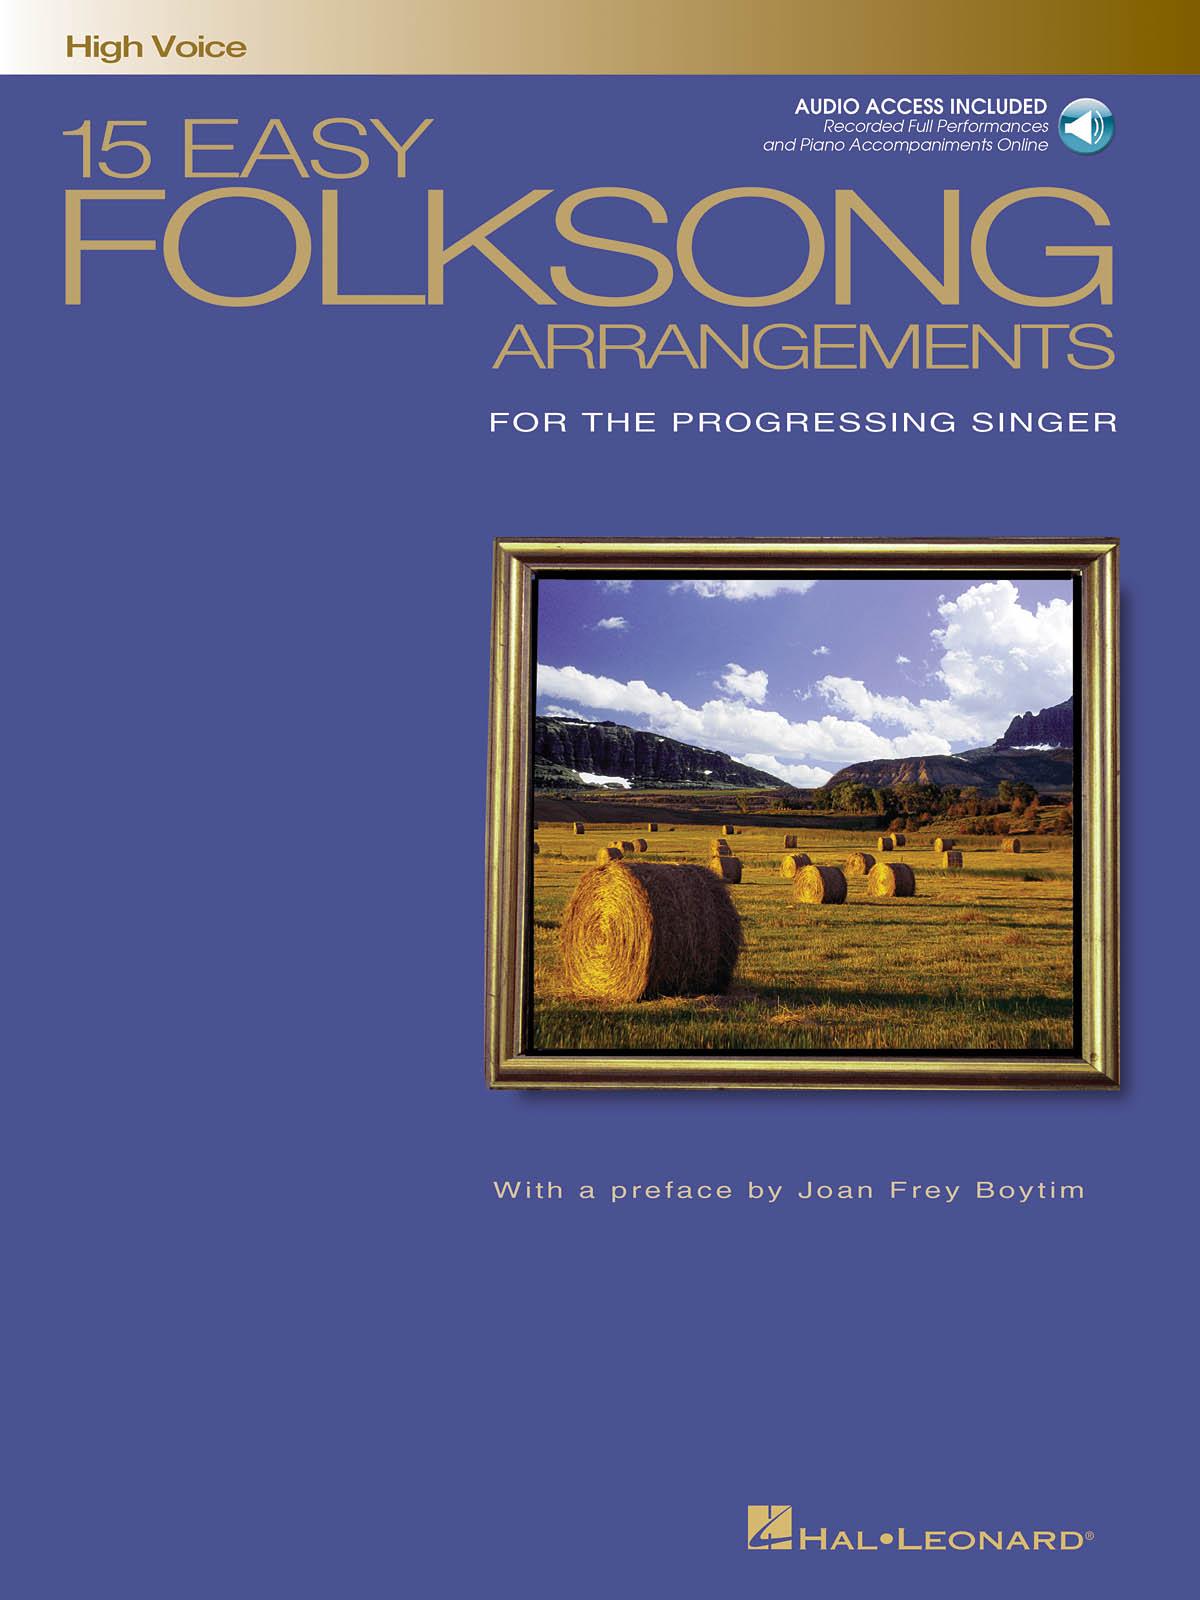 15 Easy Folksong Arrangements: Vocal Solo: Vocal Album